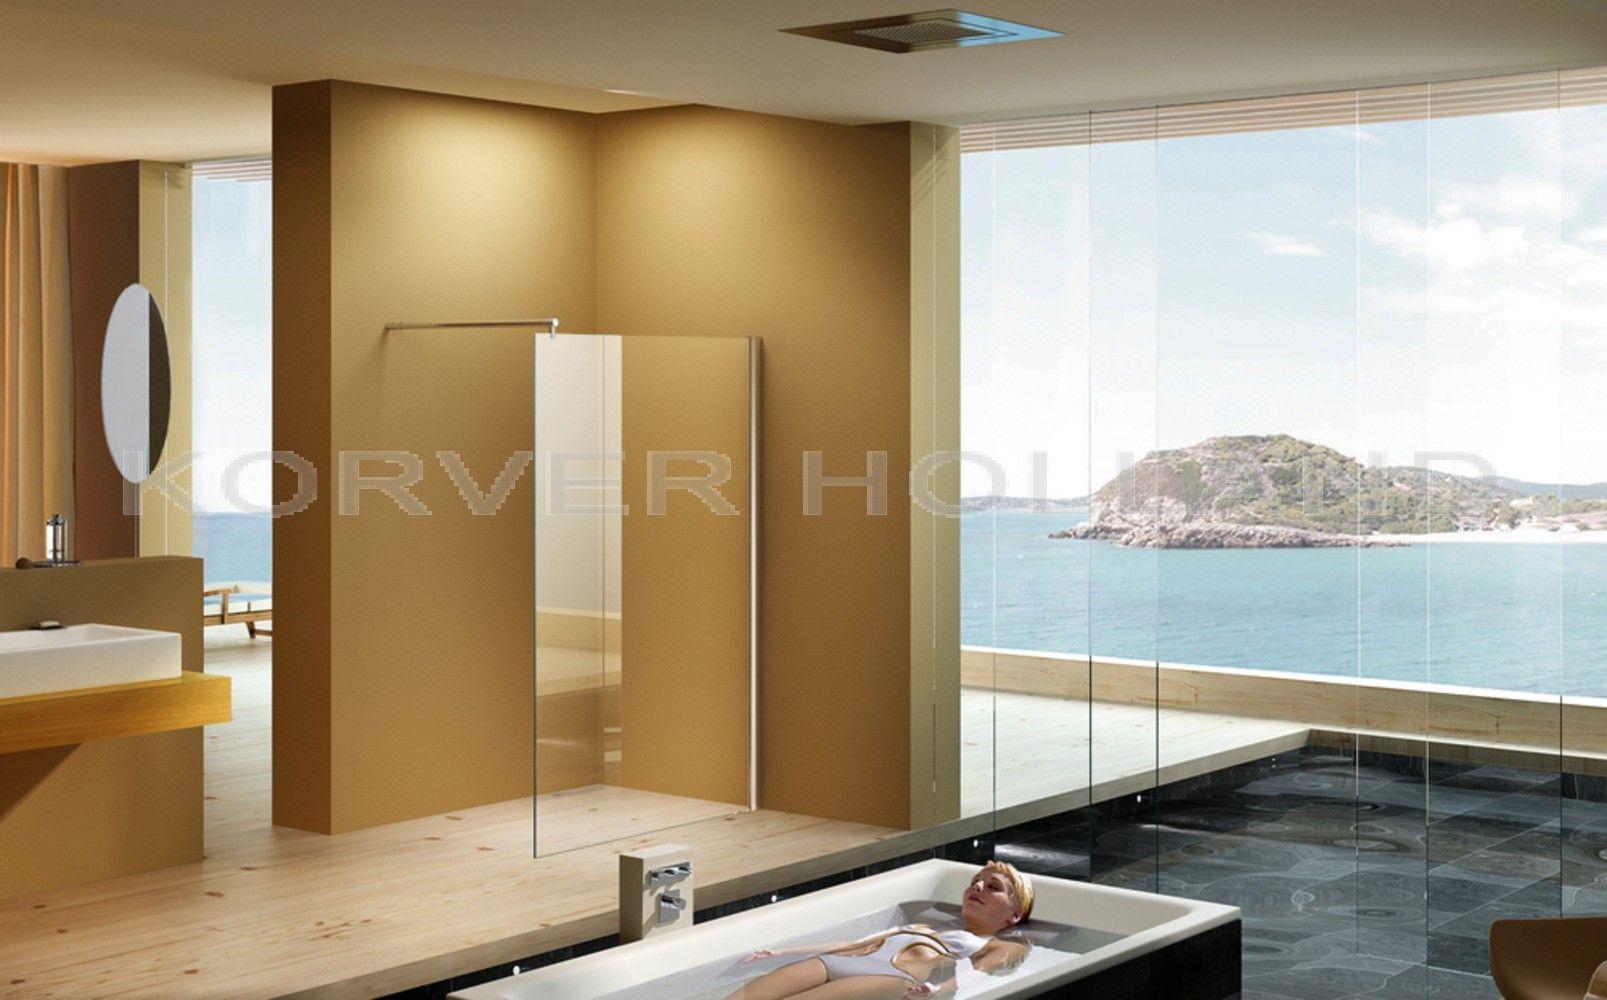 korver eco inloopdouche 900x2000mm. Black Bedroom Furniture Sets. Home Design Ideas